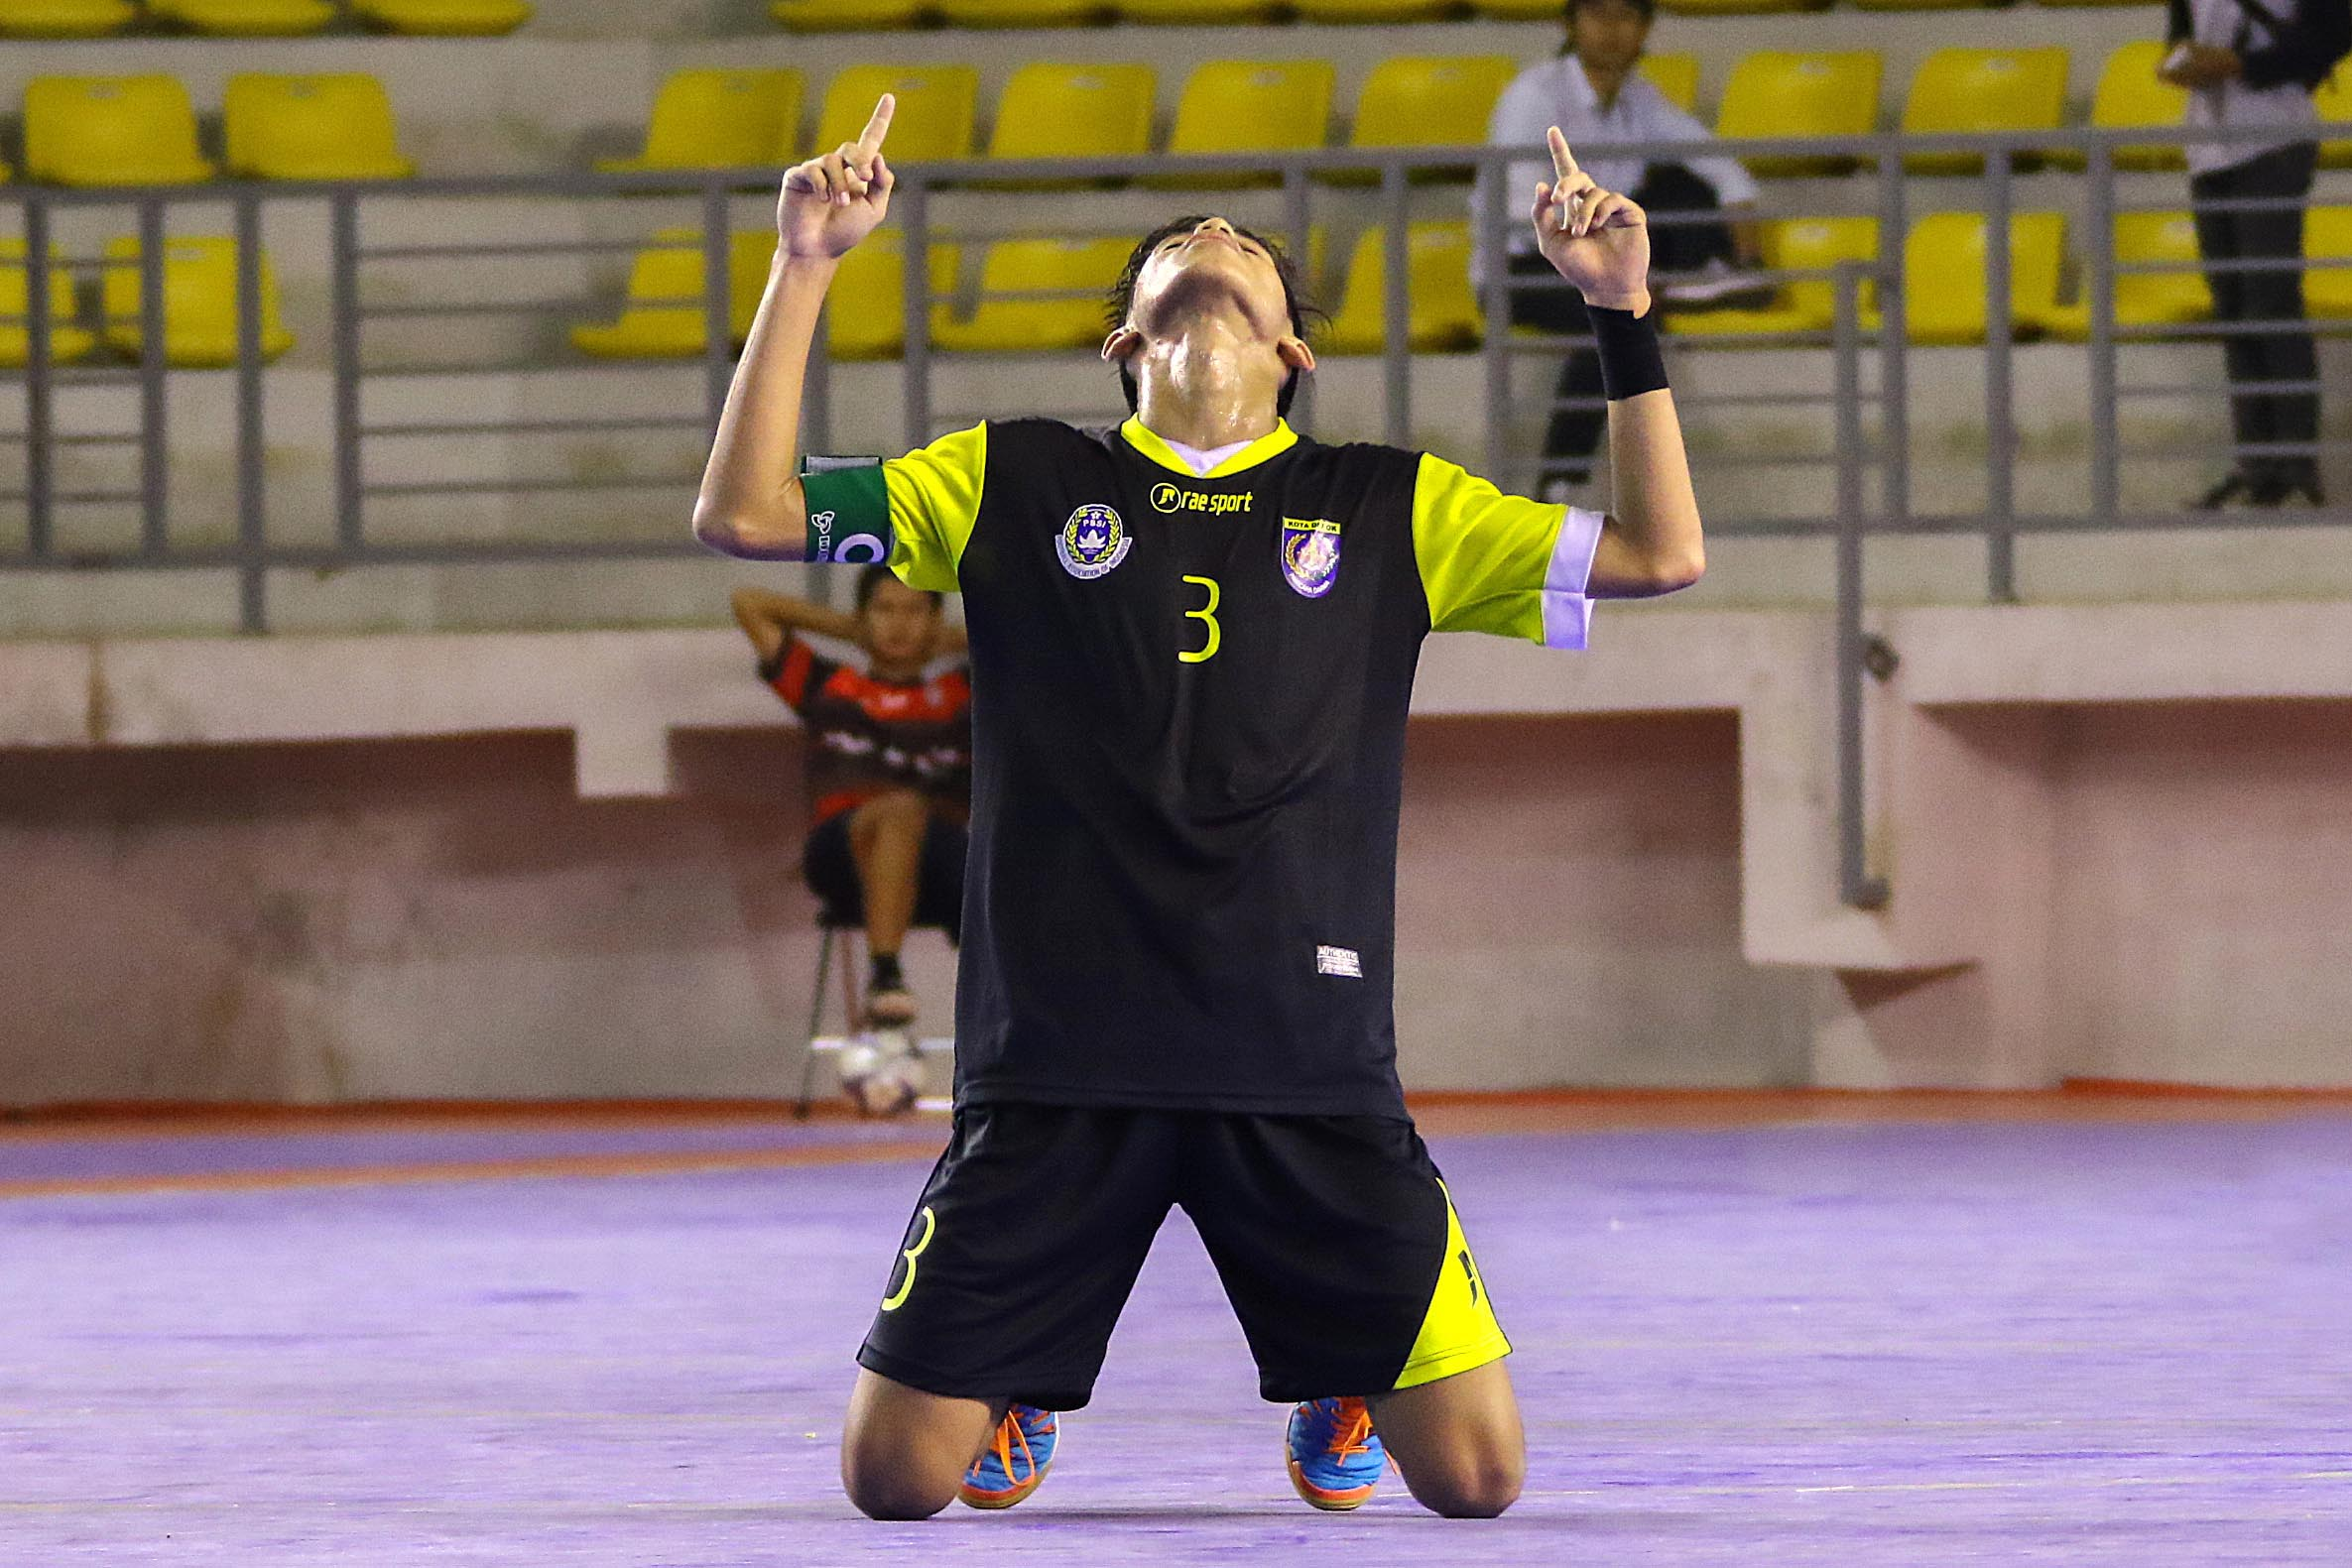 Selebrasi Pemain Futsal Kota Depok usai memenangi laga dengan Kab Karawang